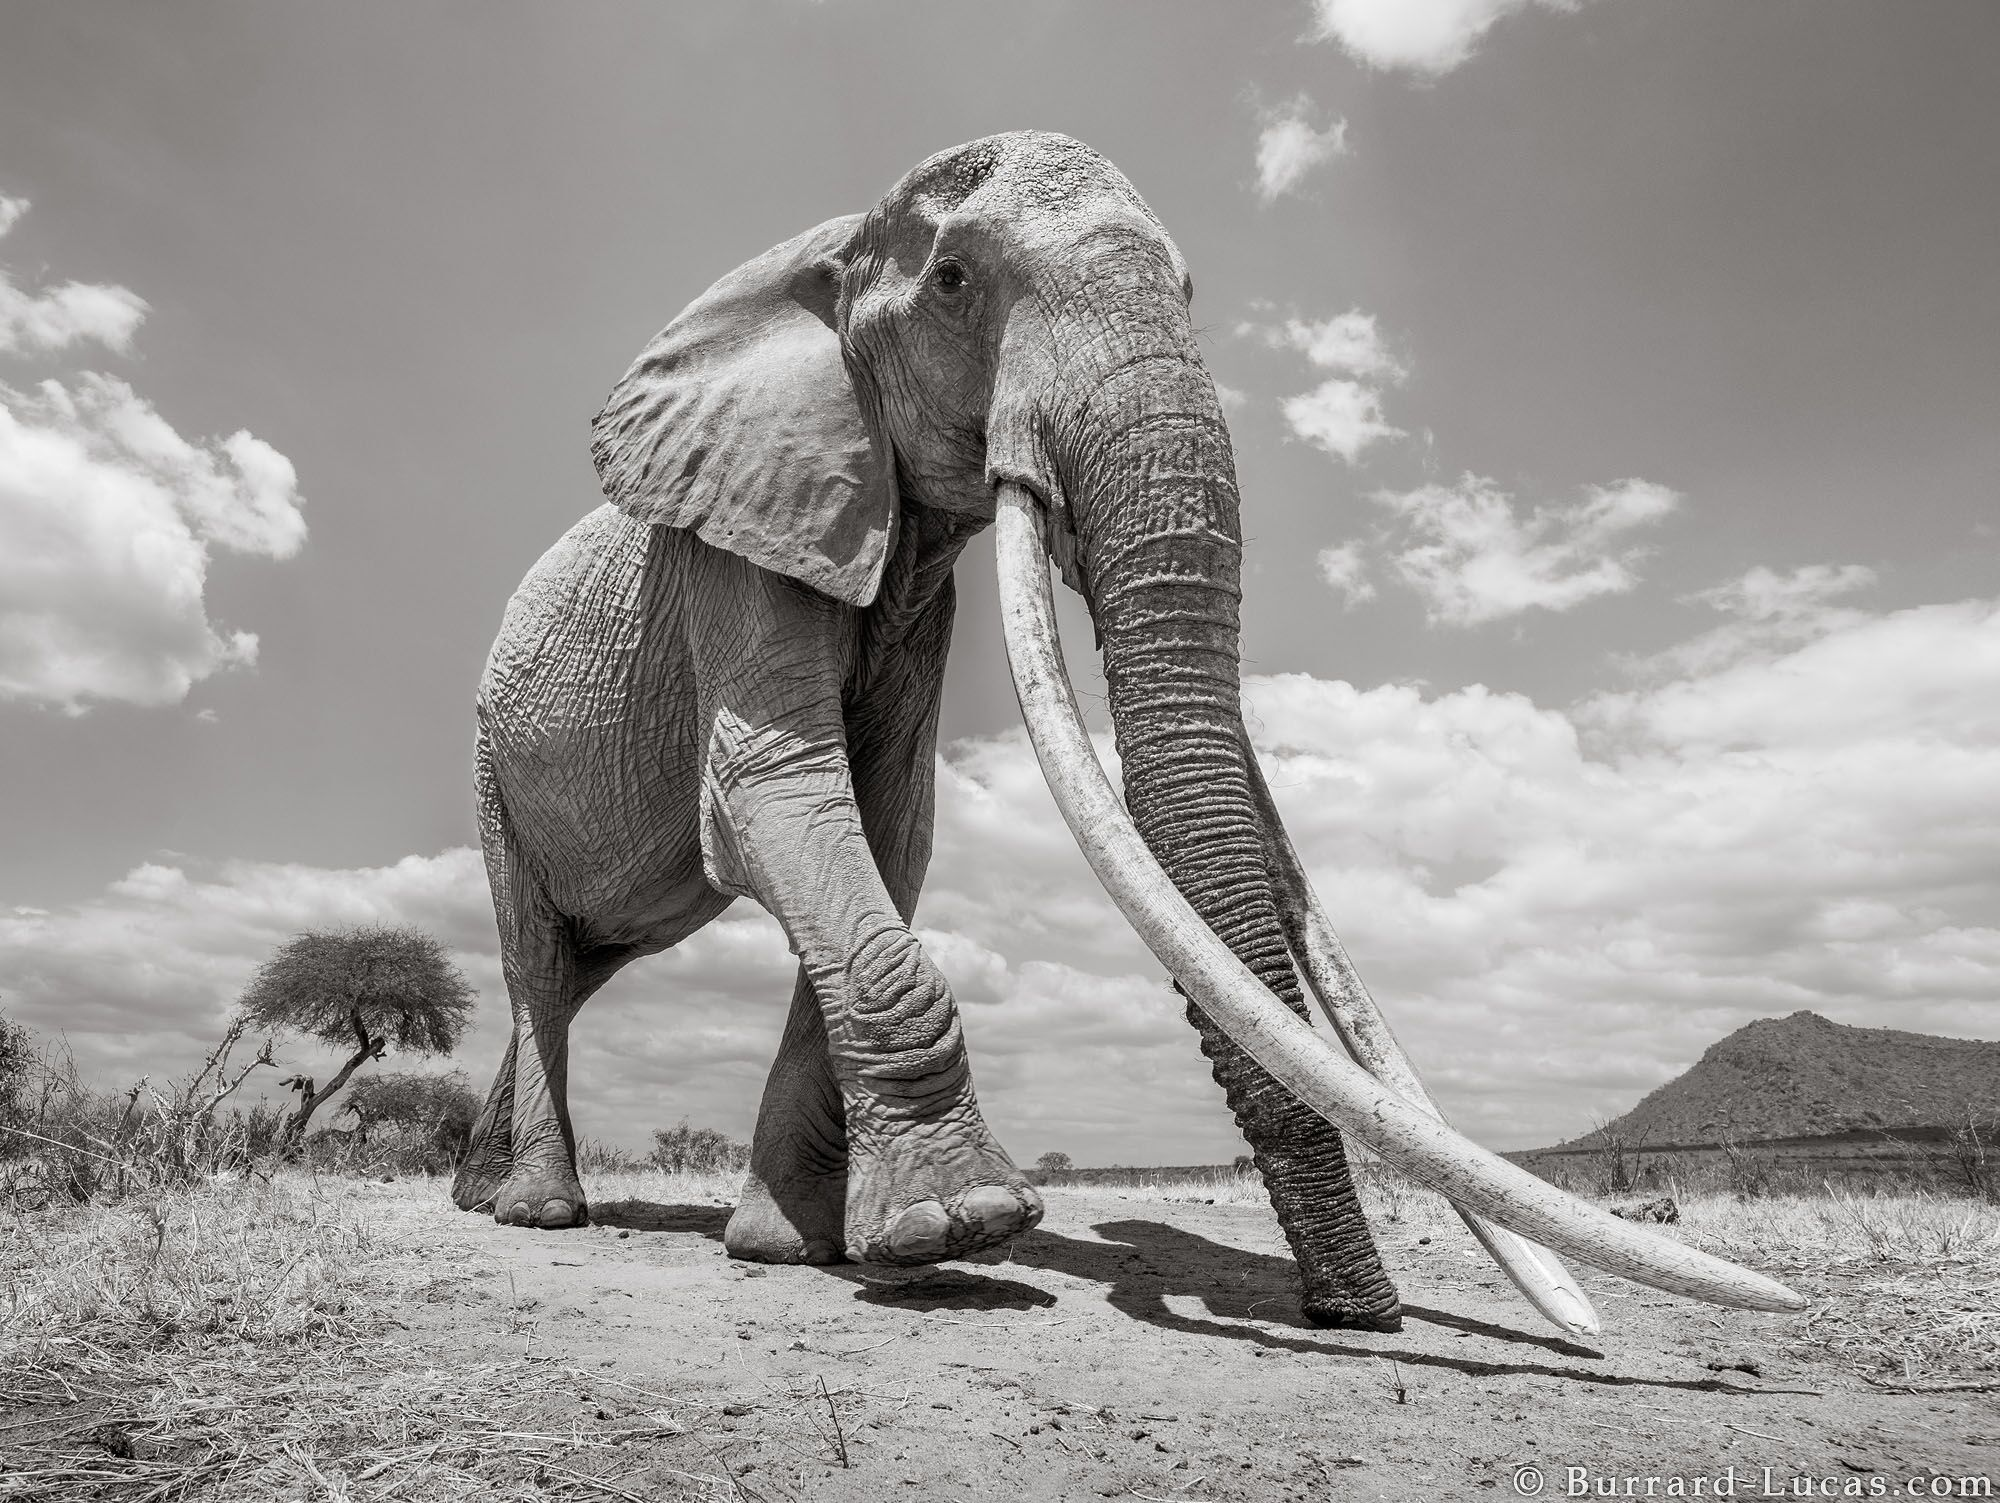 Rare photos capture the 'Elephant Queen' of Kenya.